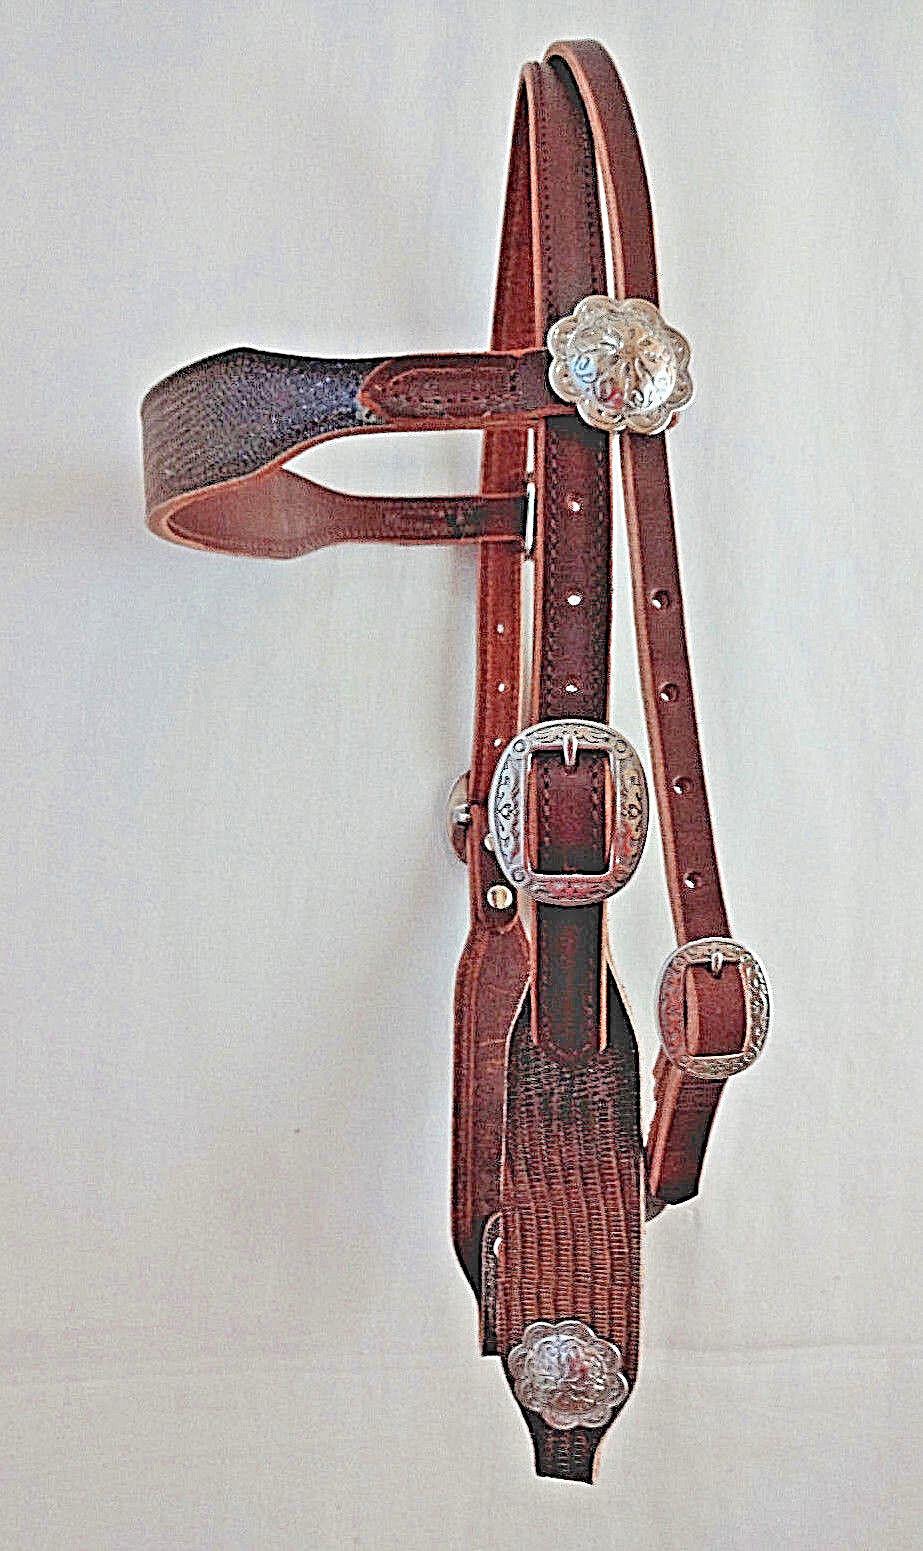 Glitter Lizard Print Headstall Harness Leather Jeremiah Watt Conchos Horse Tack